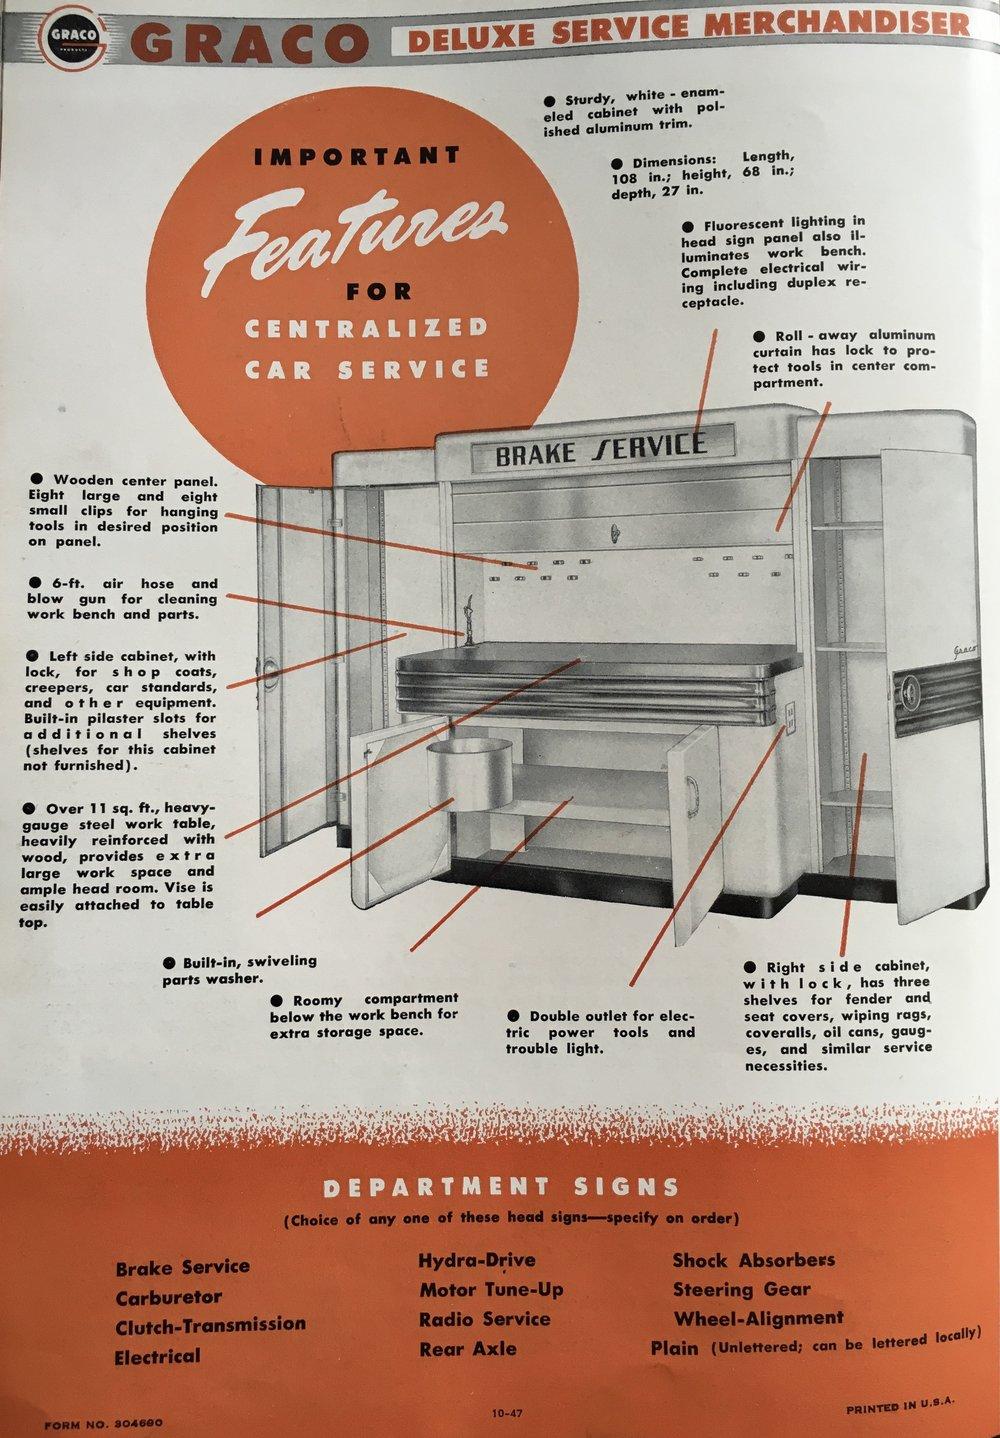 Graco_Merchandiser_Ad_1947.jpg